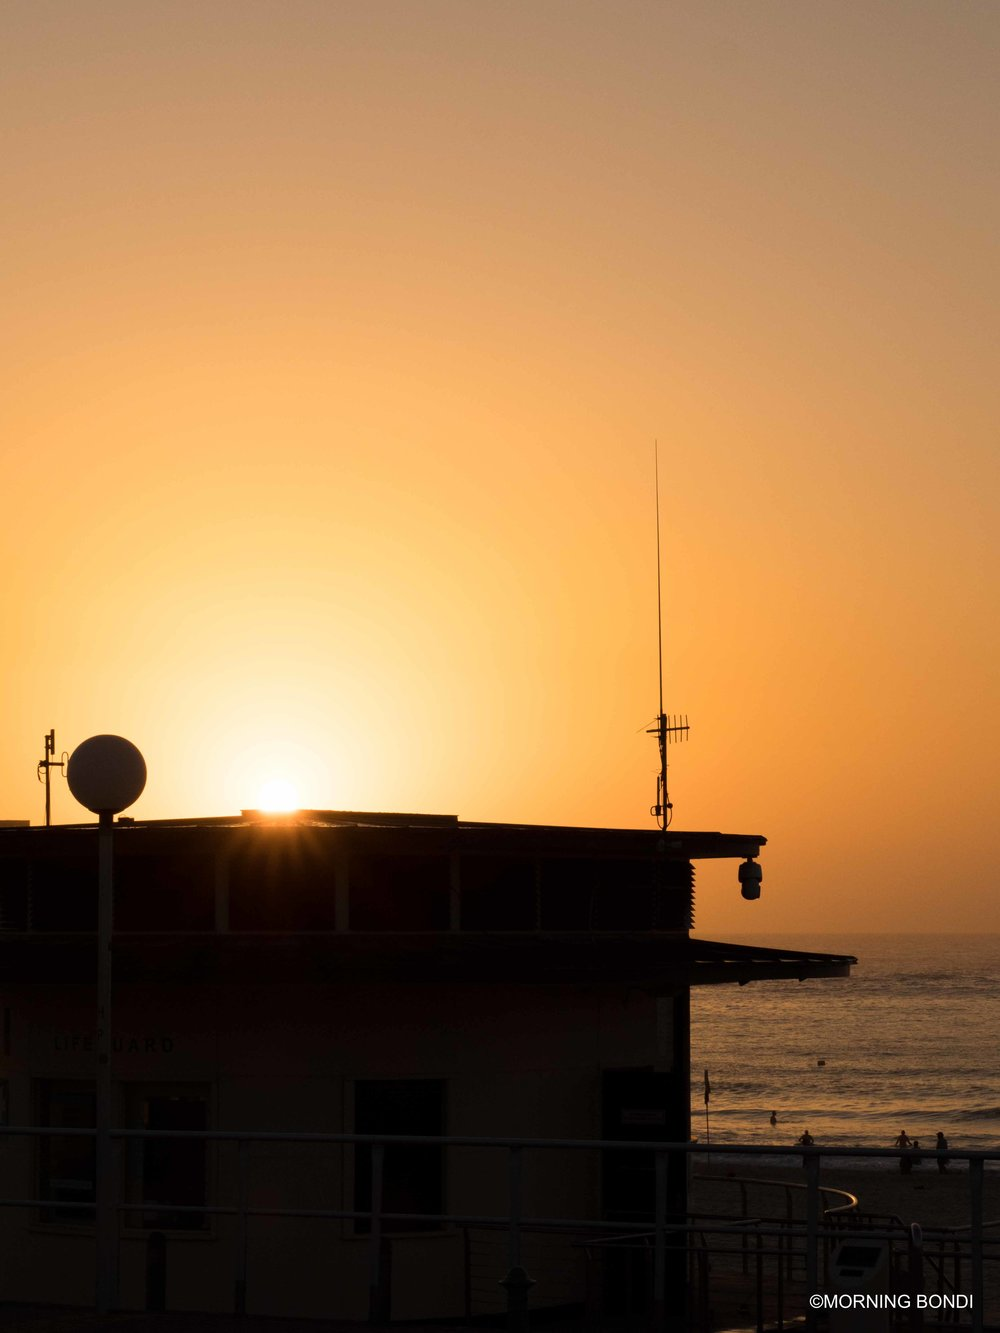 The iconic Bondi Lifeguards tower